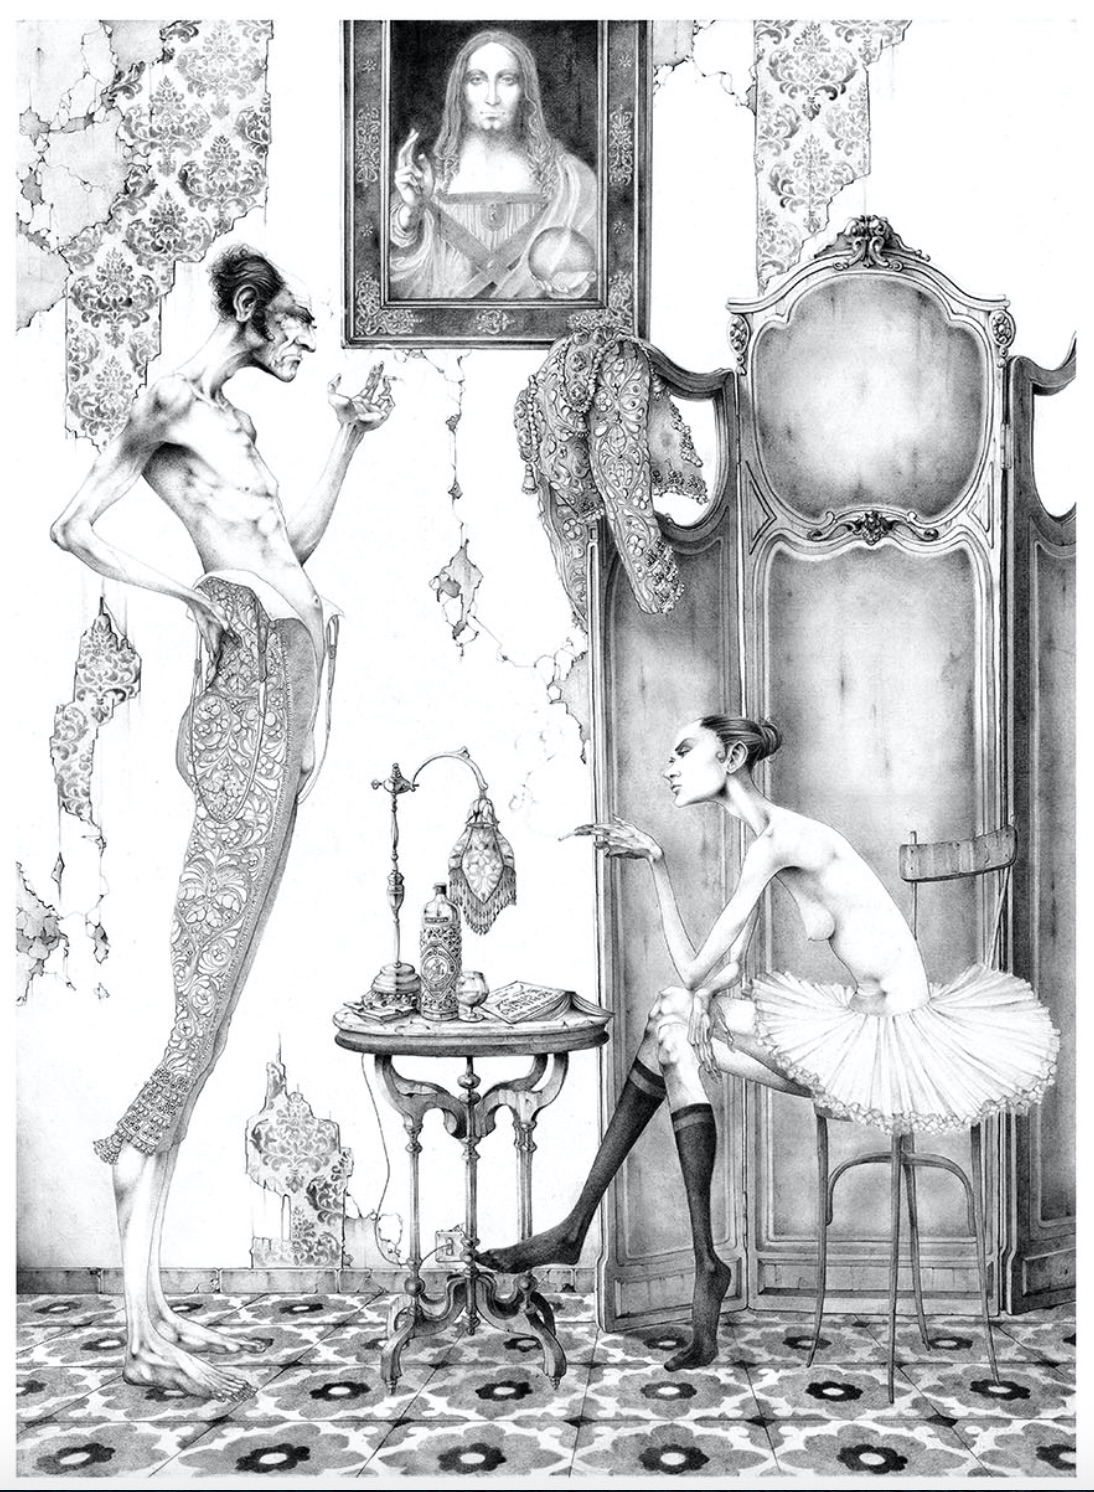 Adolfo Arenas Alonso drawing